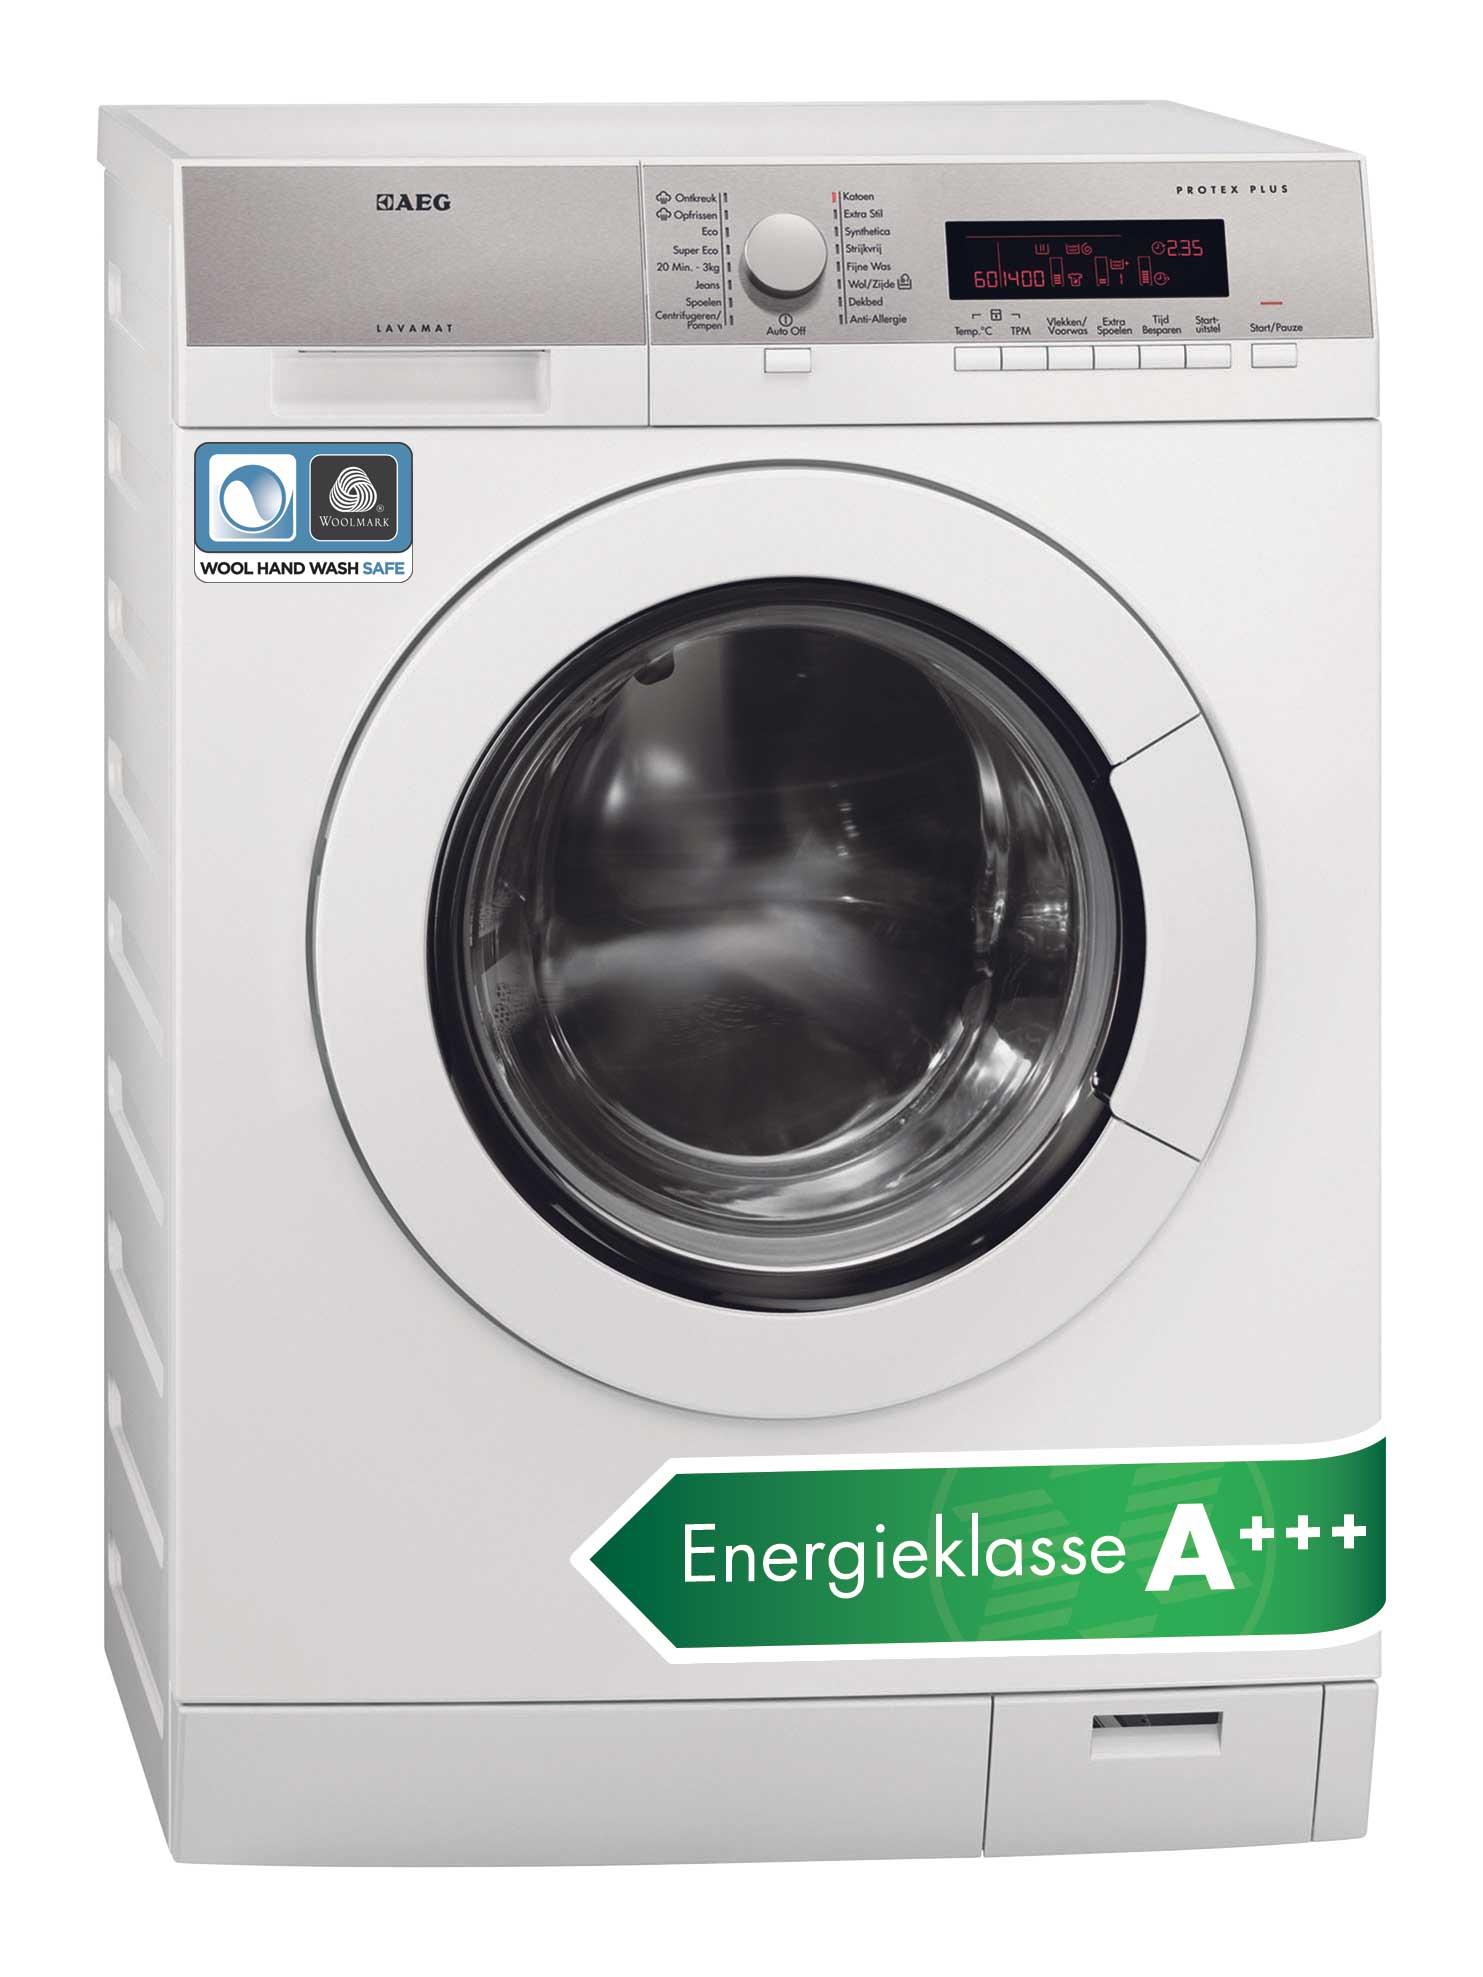 Slot aeg wasmachine